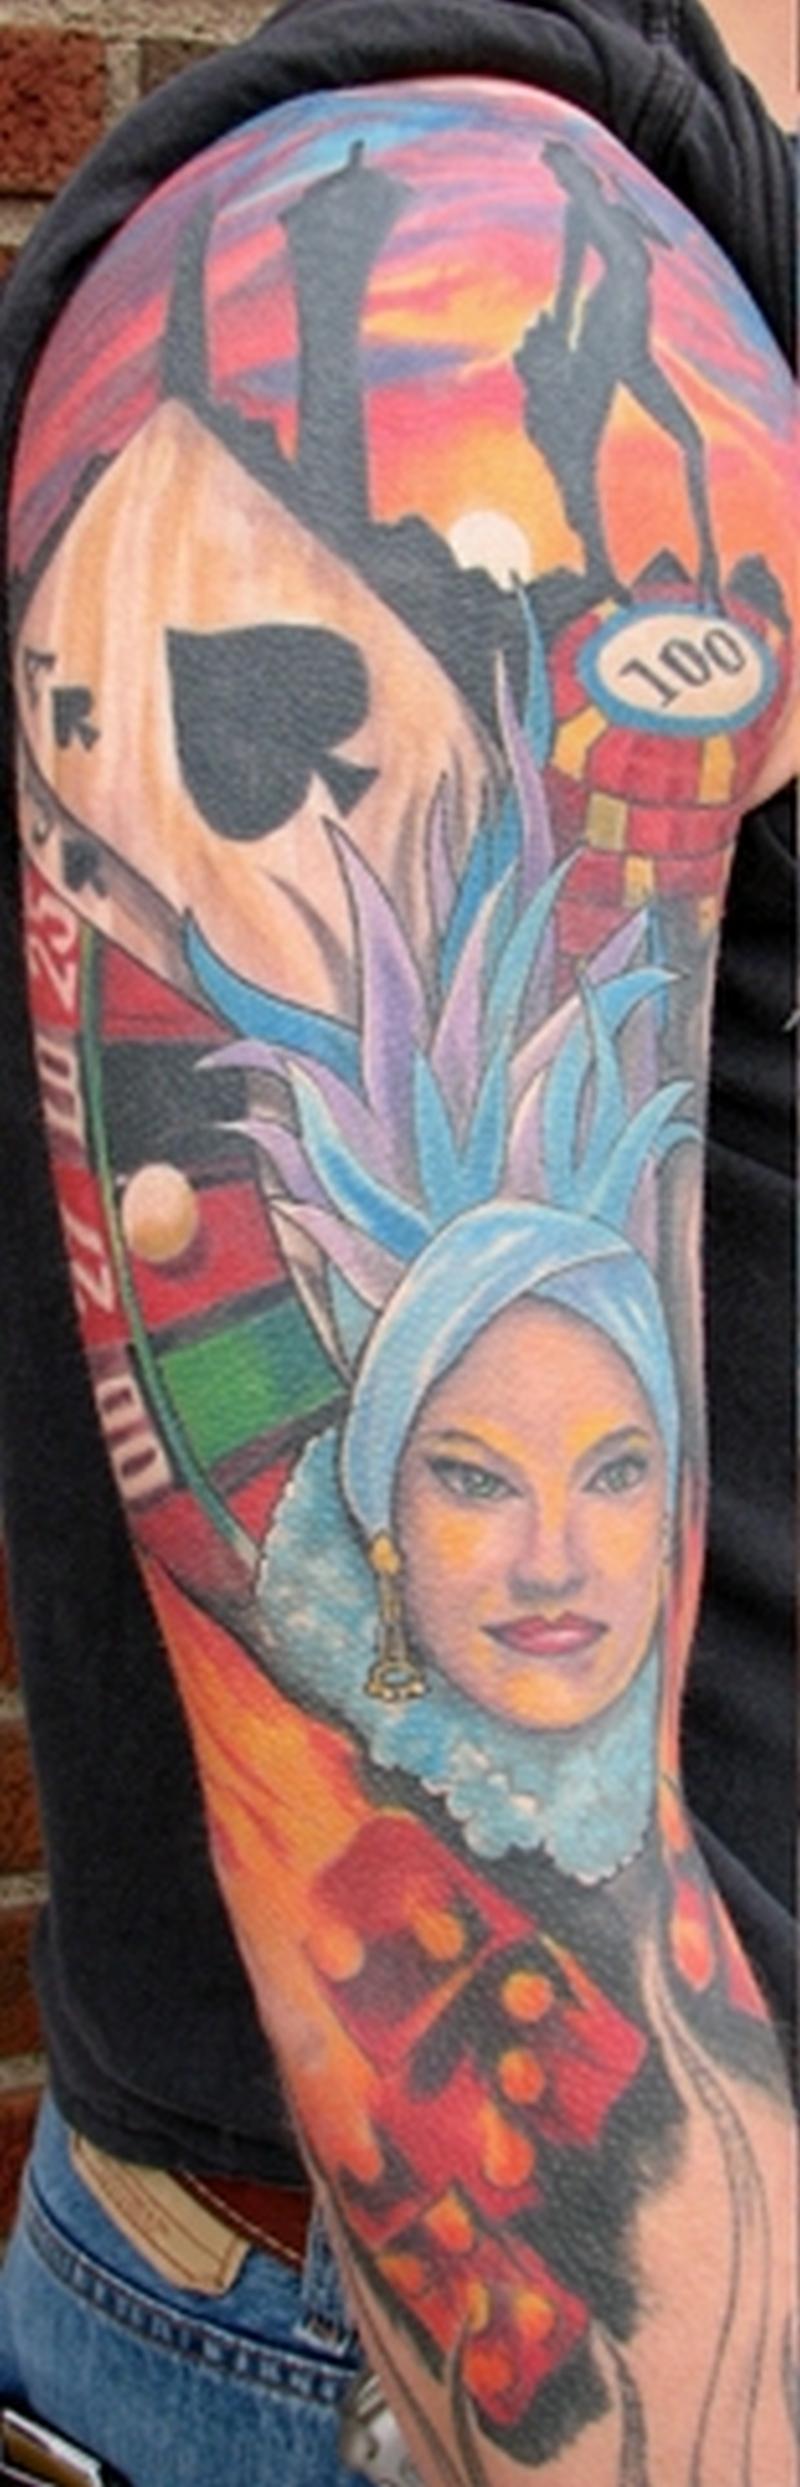 Colorful gambling tattoo design on sleeve 3